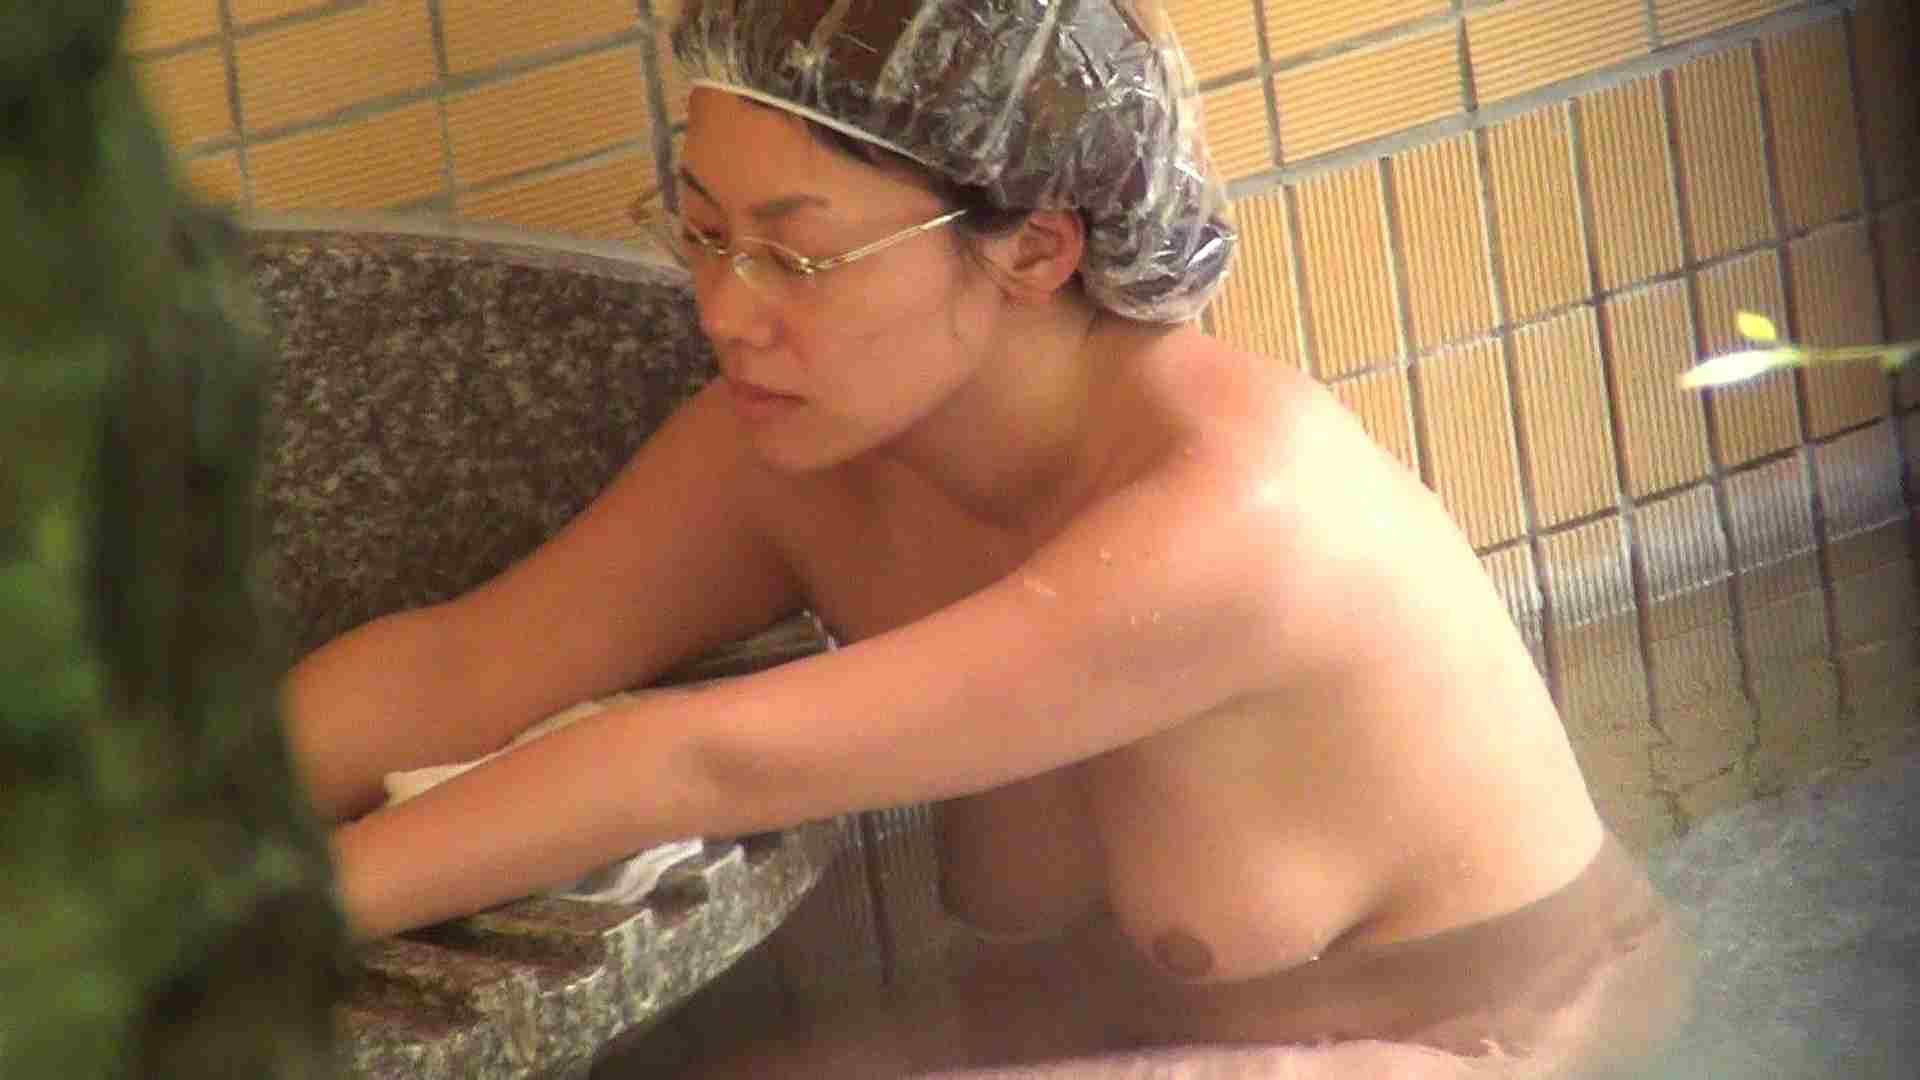 Aquaな露天風呂Vol.280 露天風呂突入 SEX無修正画像 100pic 11